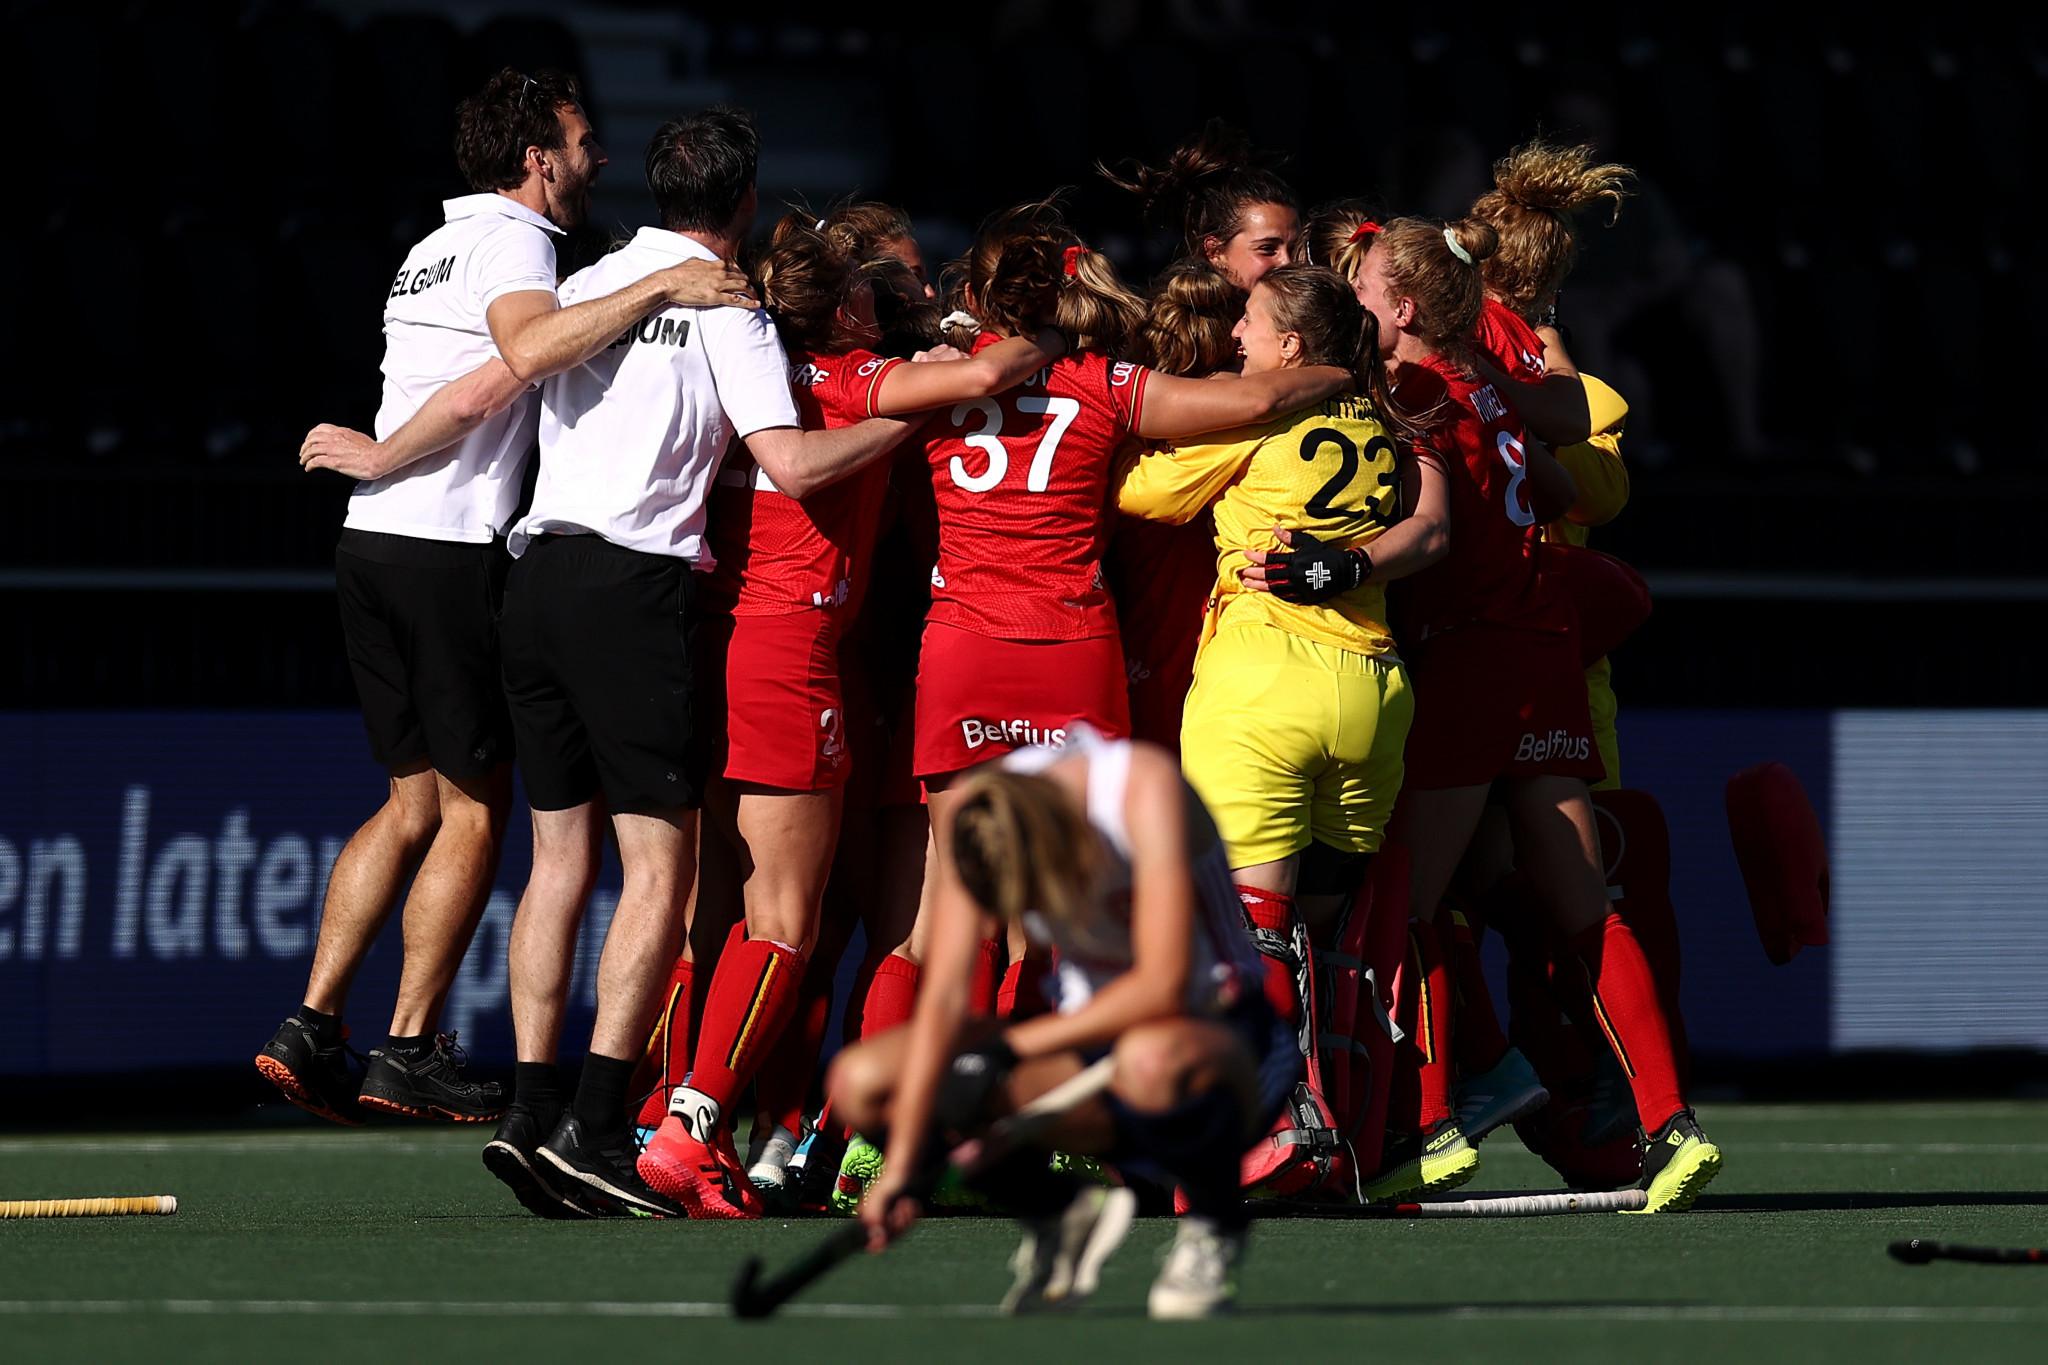 Late Belgium goal knocks England out of women's EuroHockey Championship